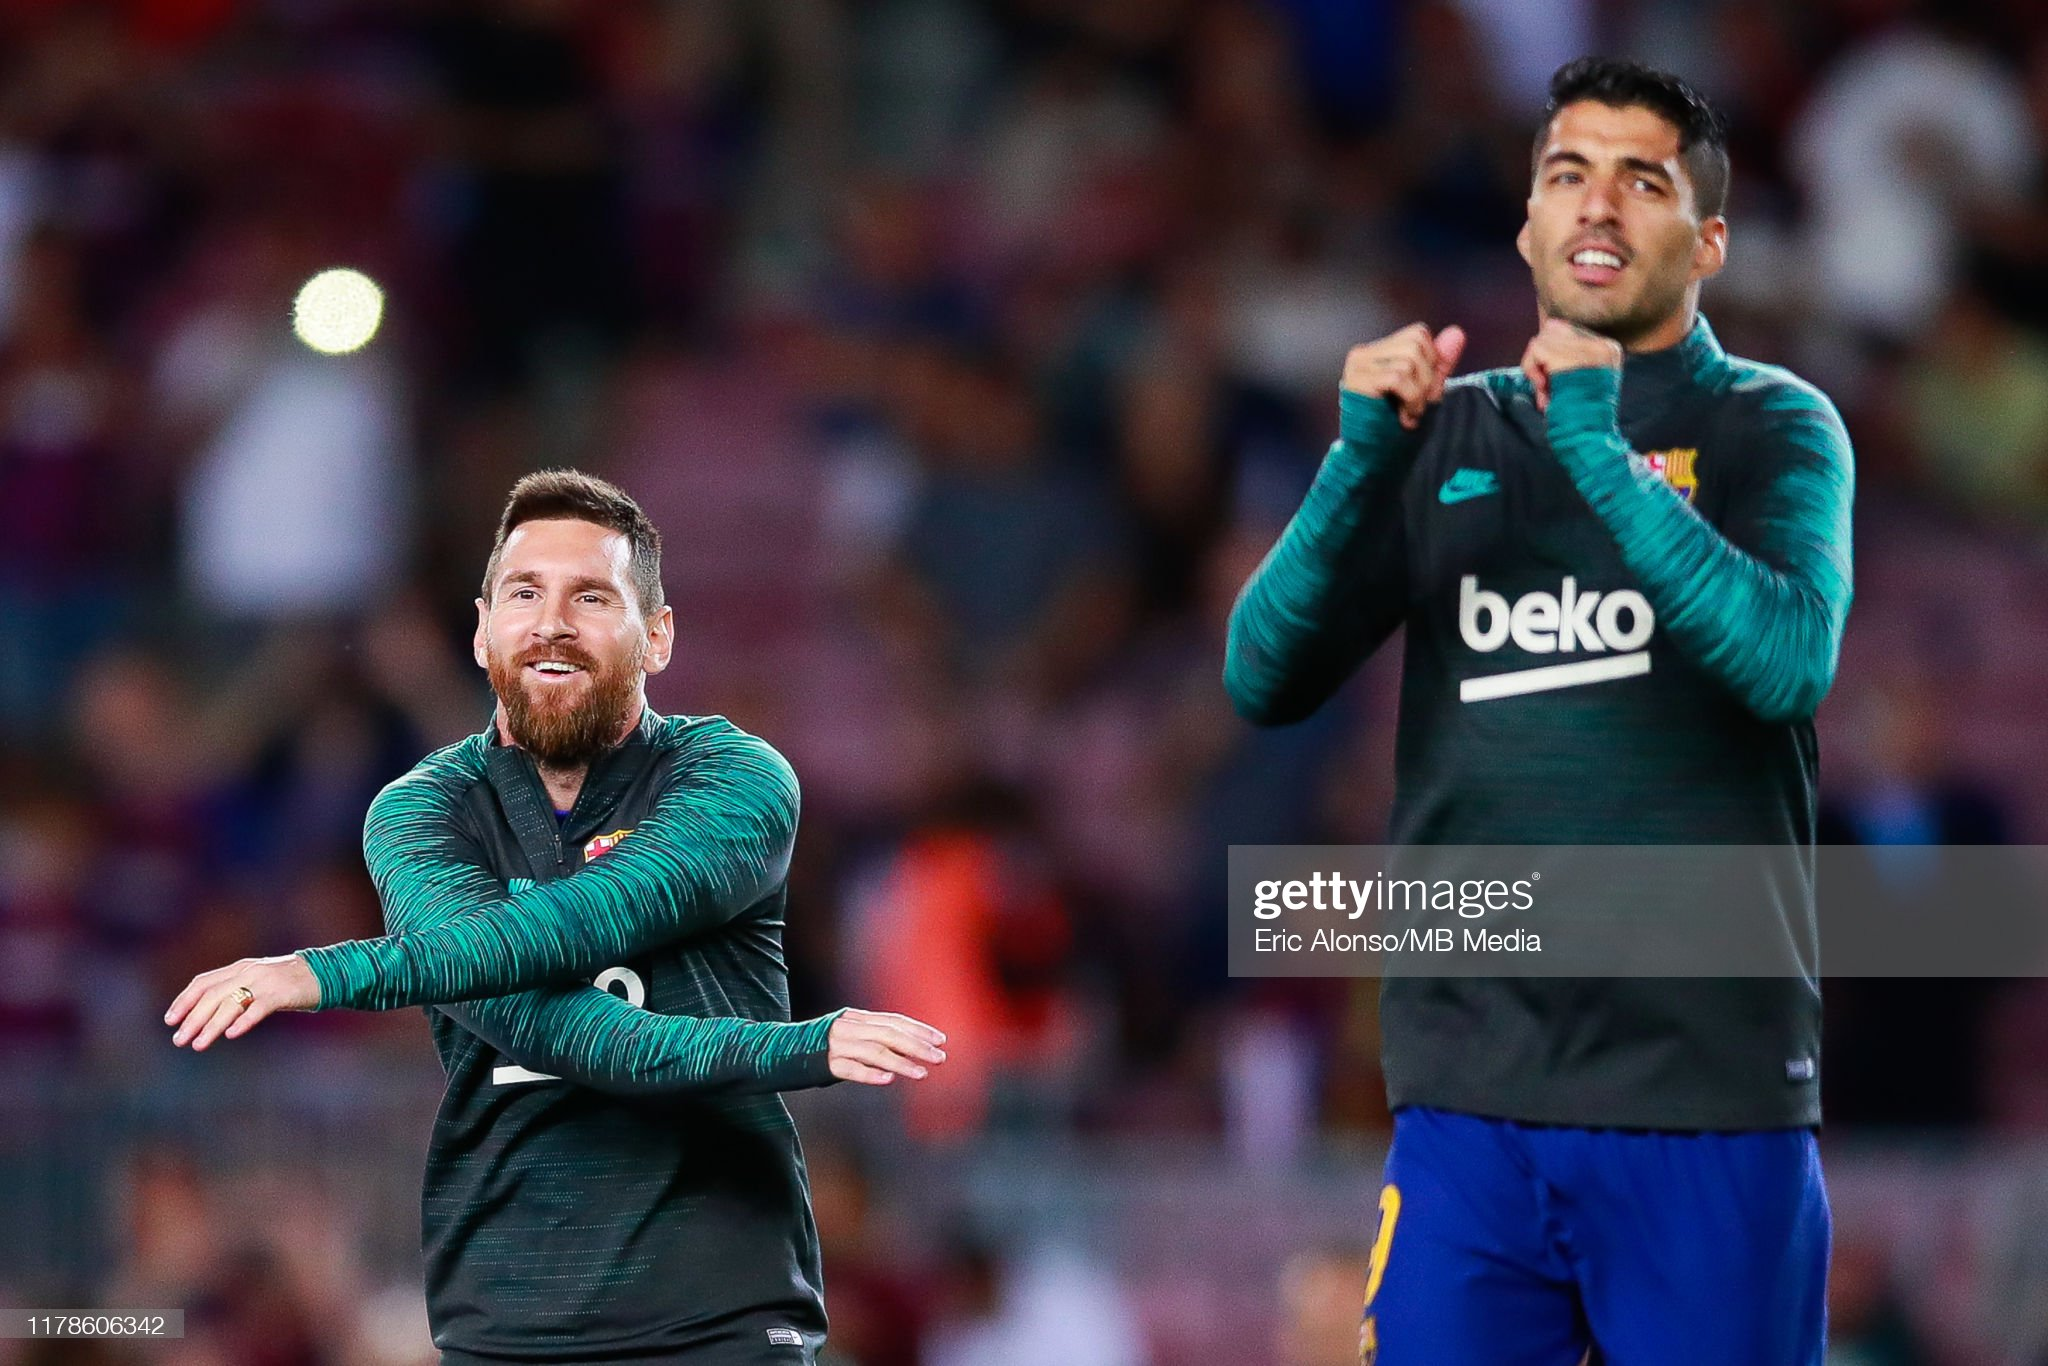 صور مباراة : برشلونة - إنتر 2-1 ( 02-10-2019 )  Lionel-messi-of-fc-barcelona-and-luis-suarez-of-fc-barcelona-during-picture-id1178606342?s=2048x2048